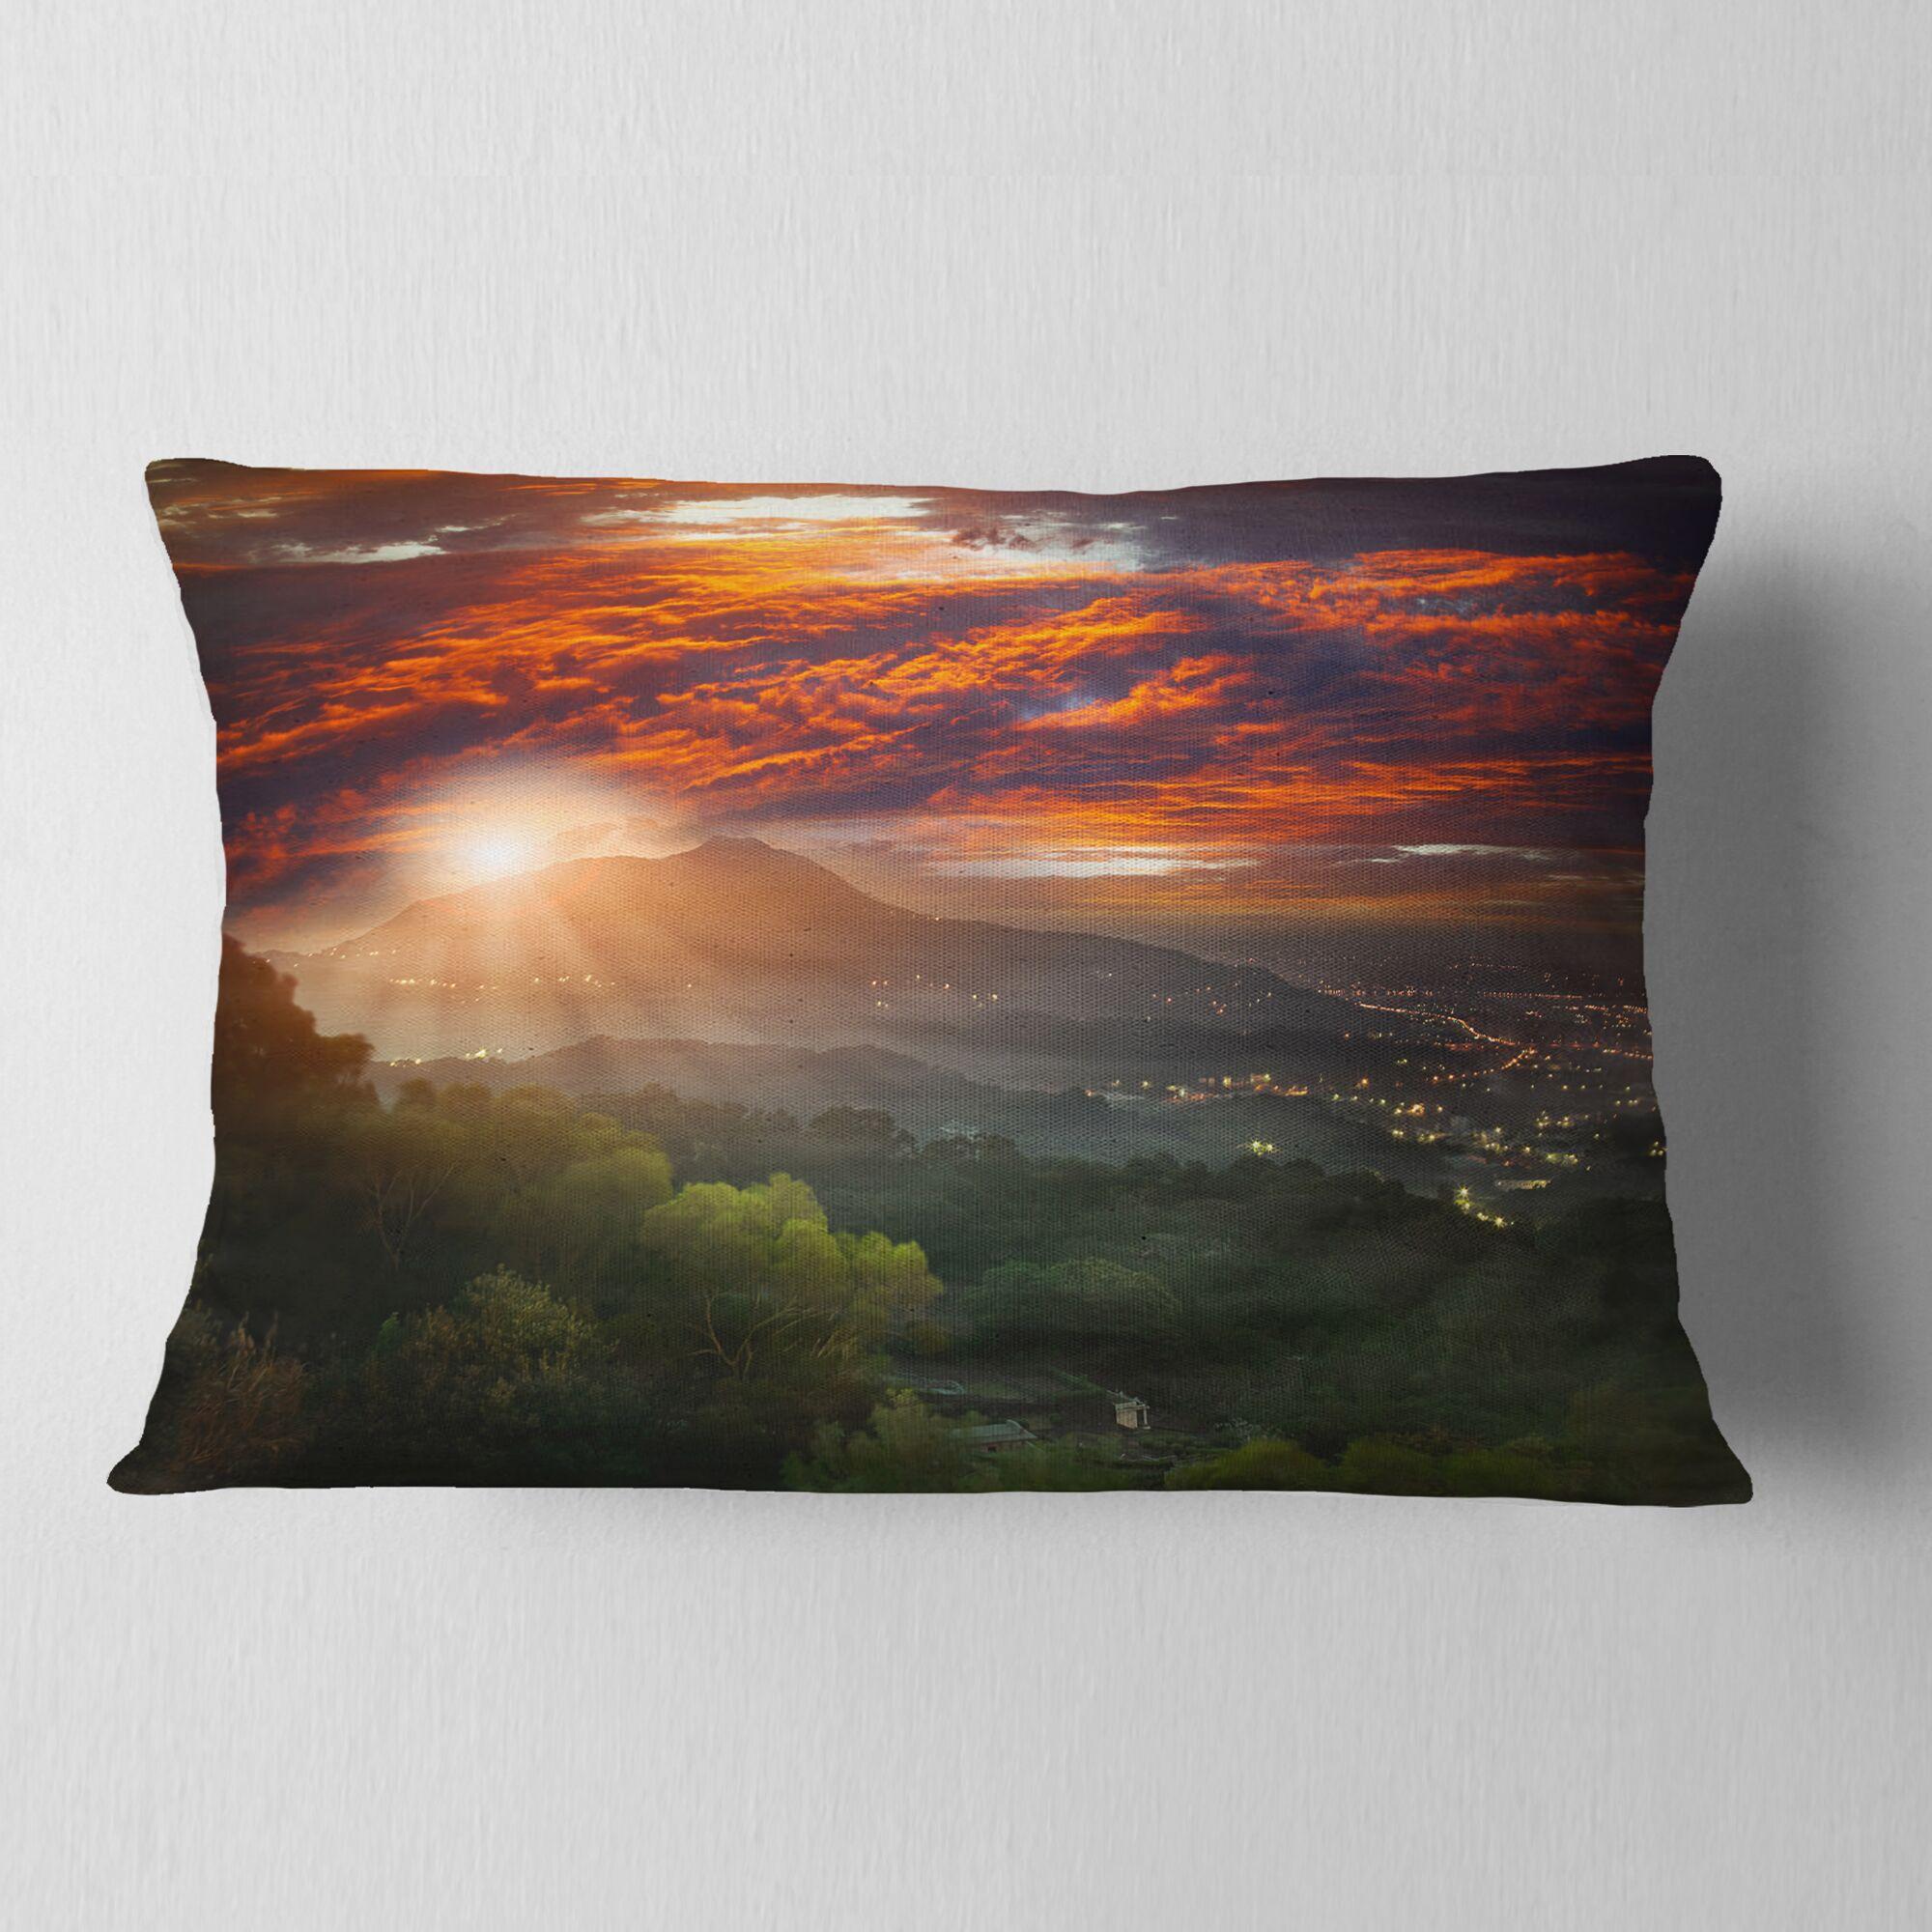 Photography Guanyin Mountain Sunrise Taipei Lumbar Pillow